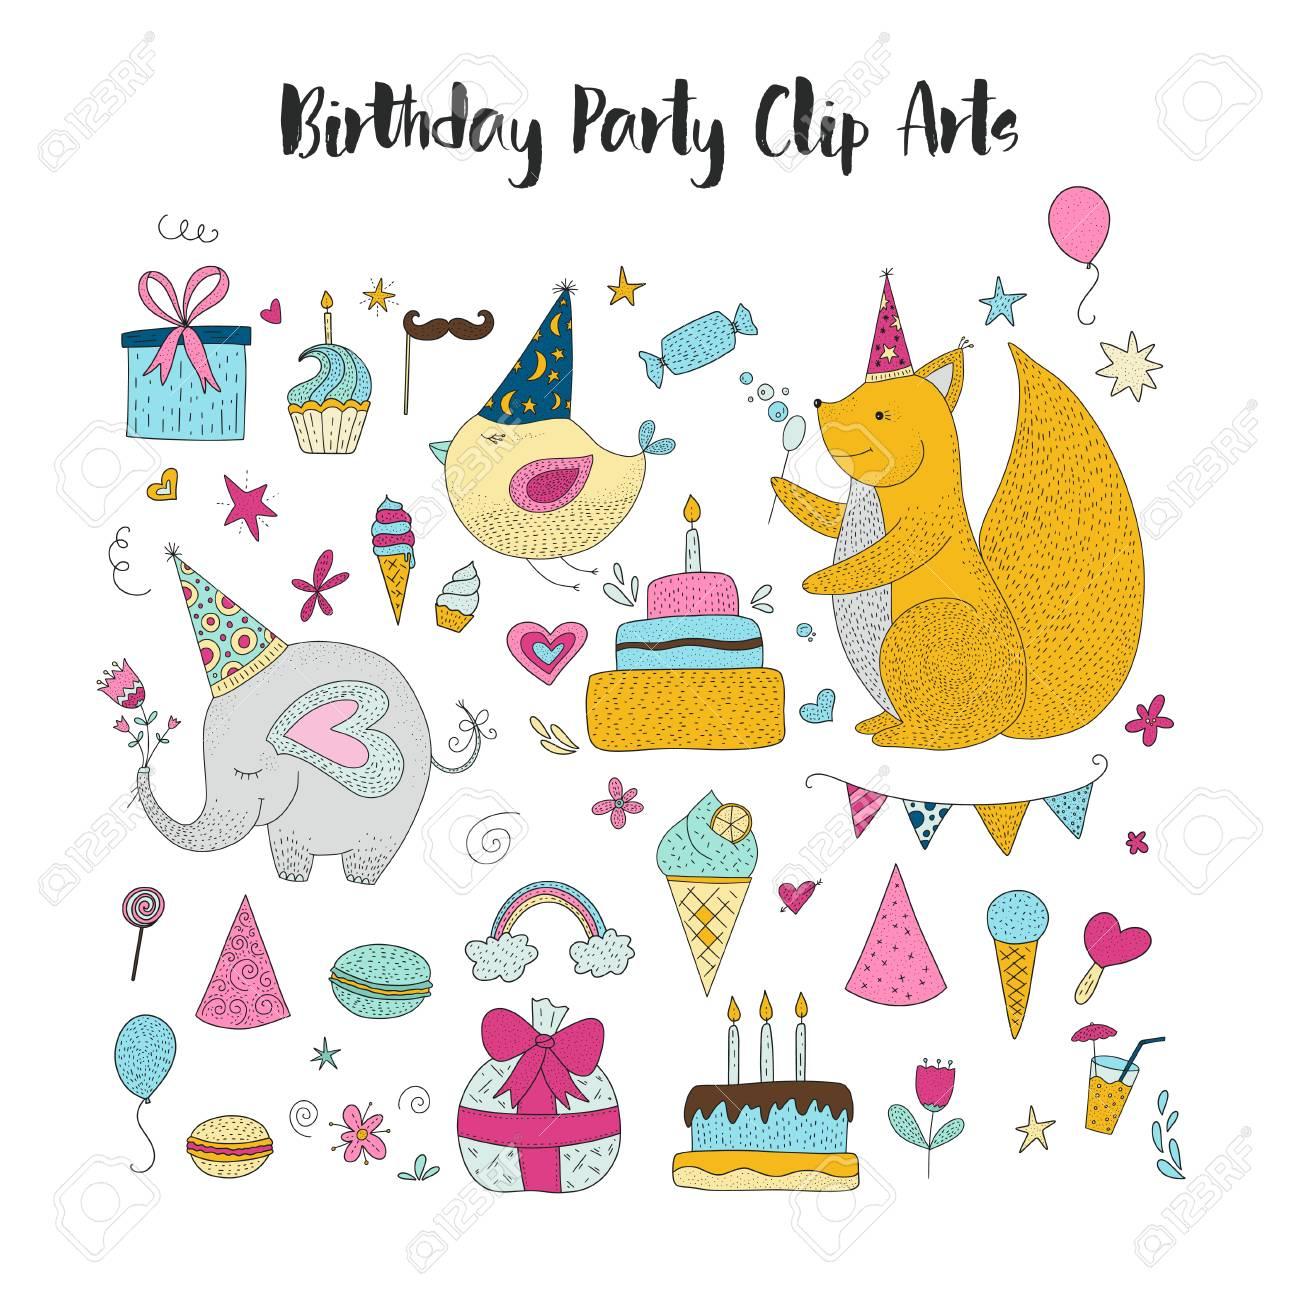 Big Set Of Birthday Party Vector Clip Arts Cute Hand Drawn Animals And Cartoon Elements